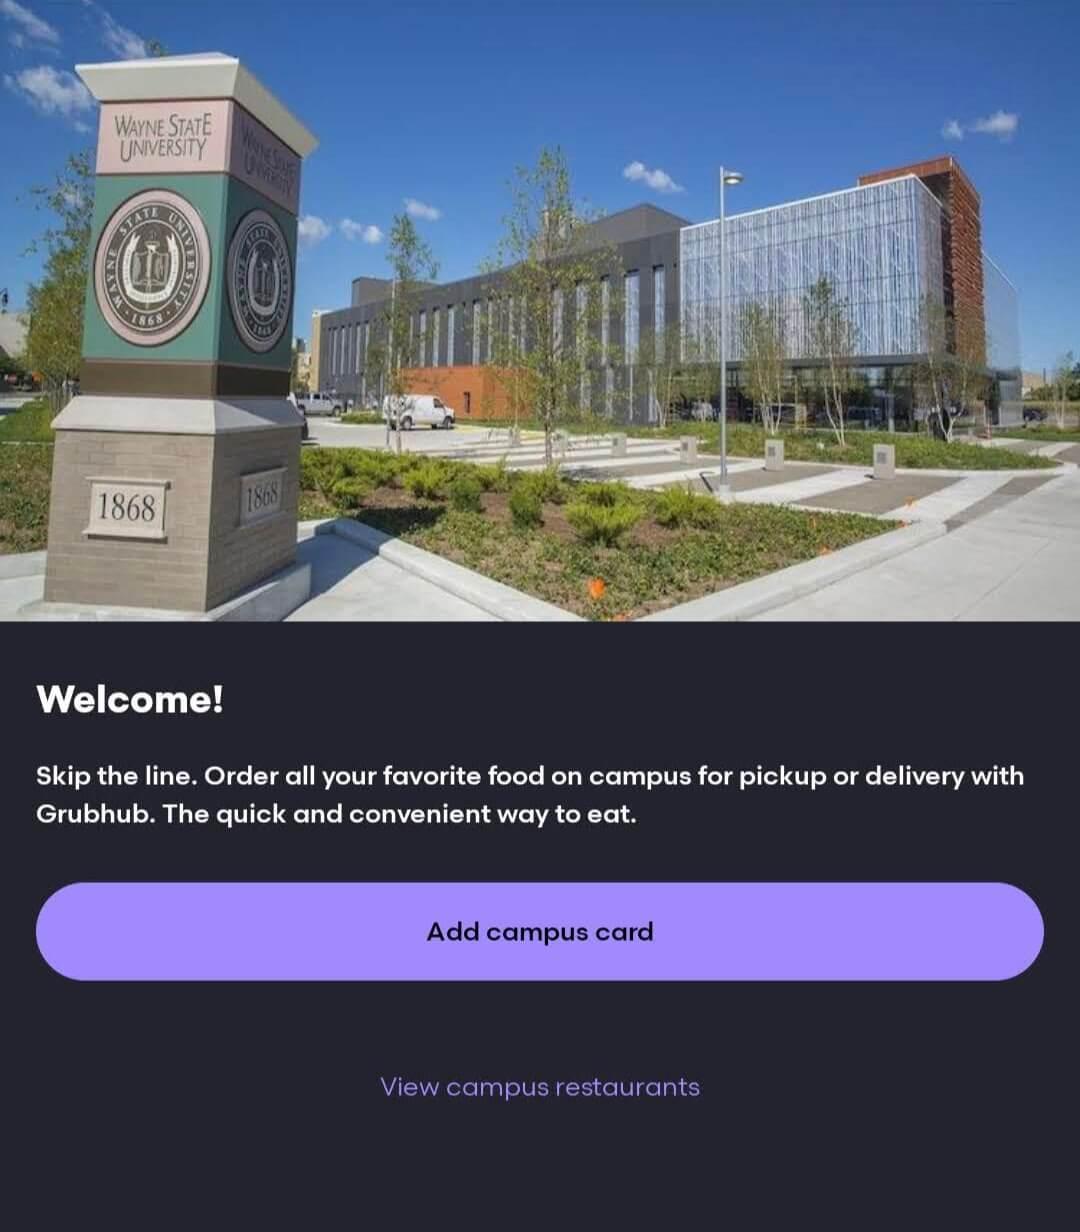 Grubhub setting to add campus